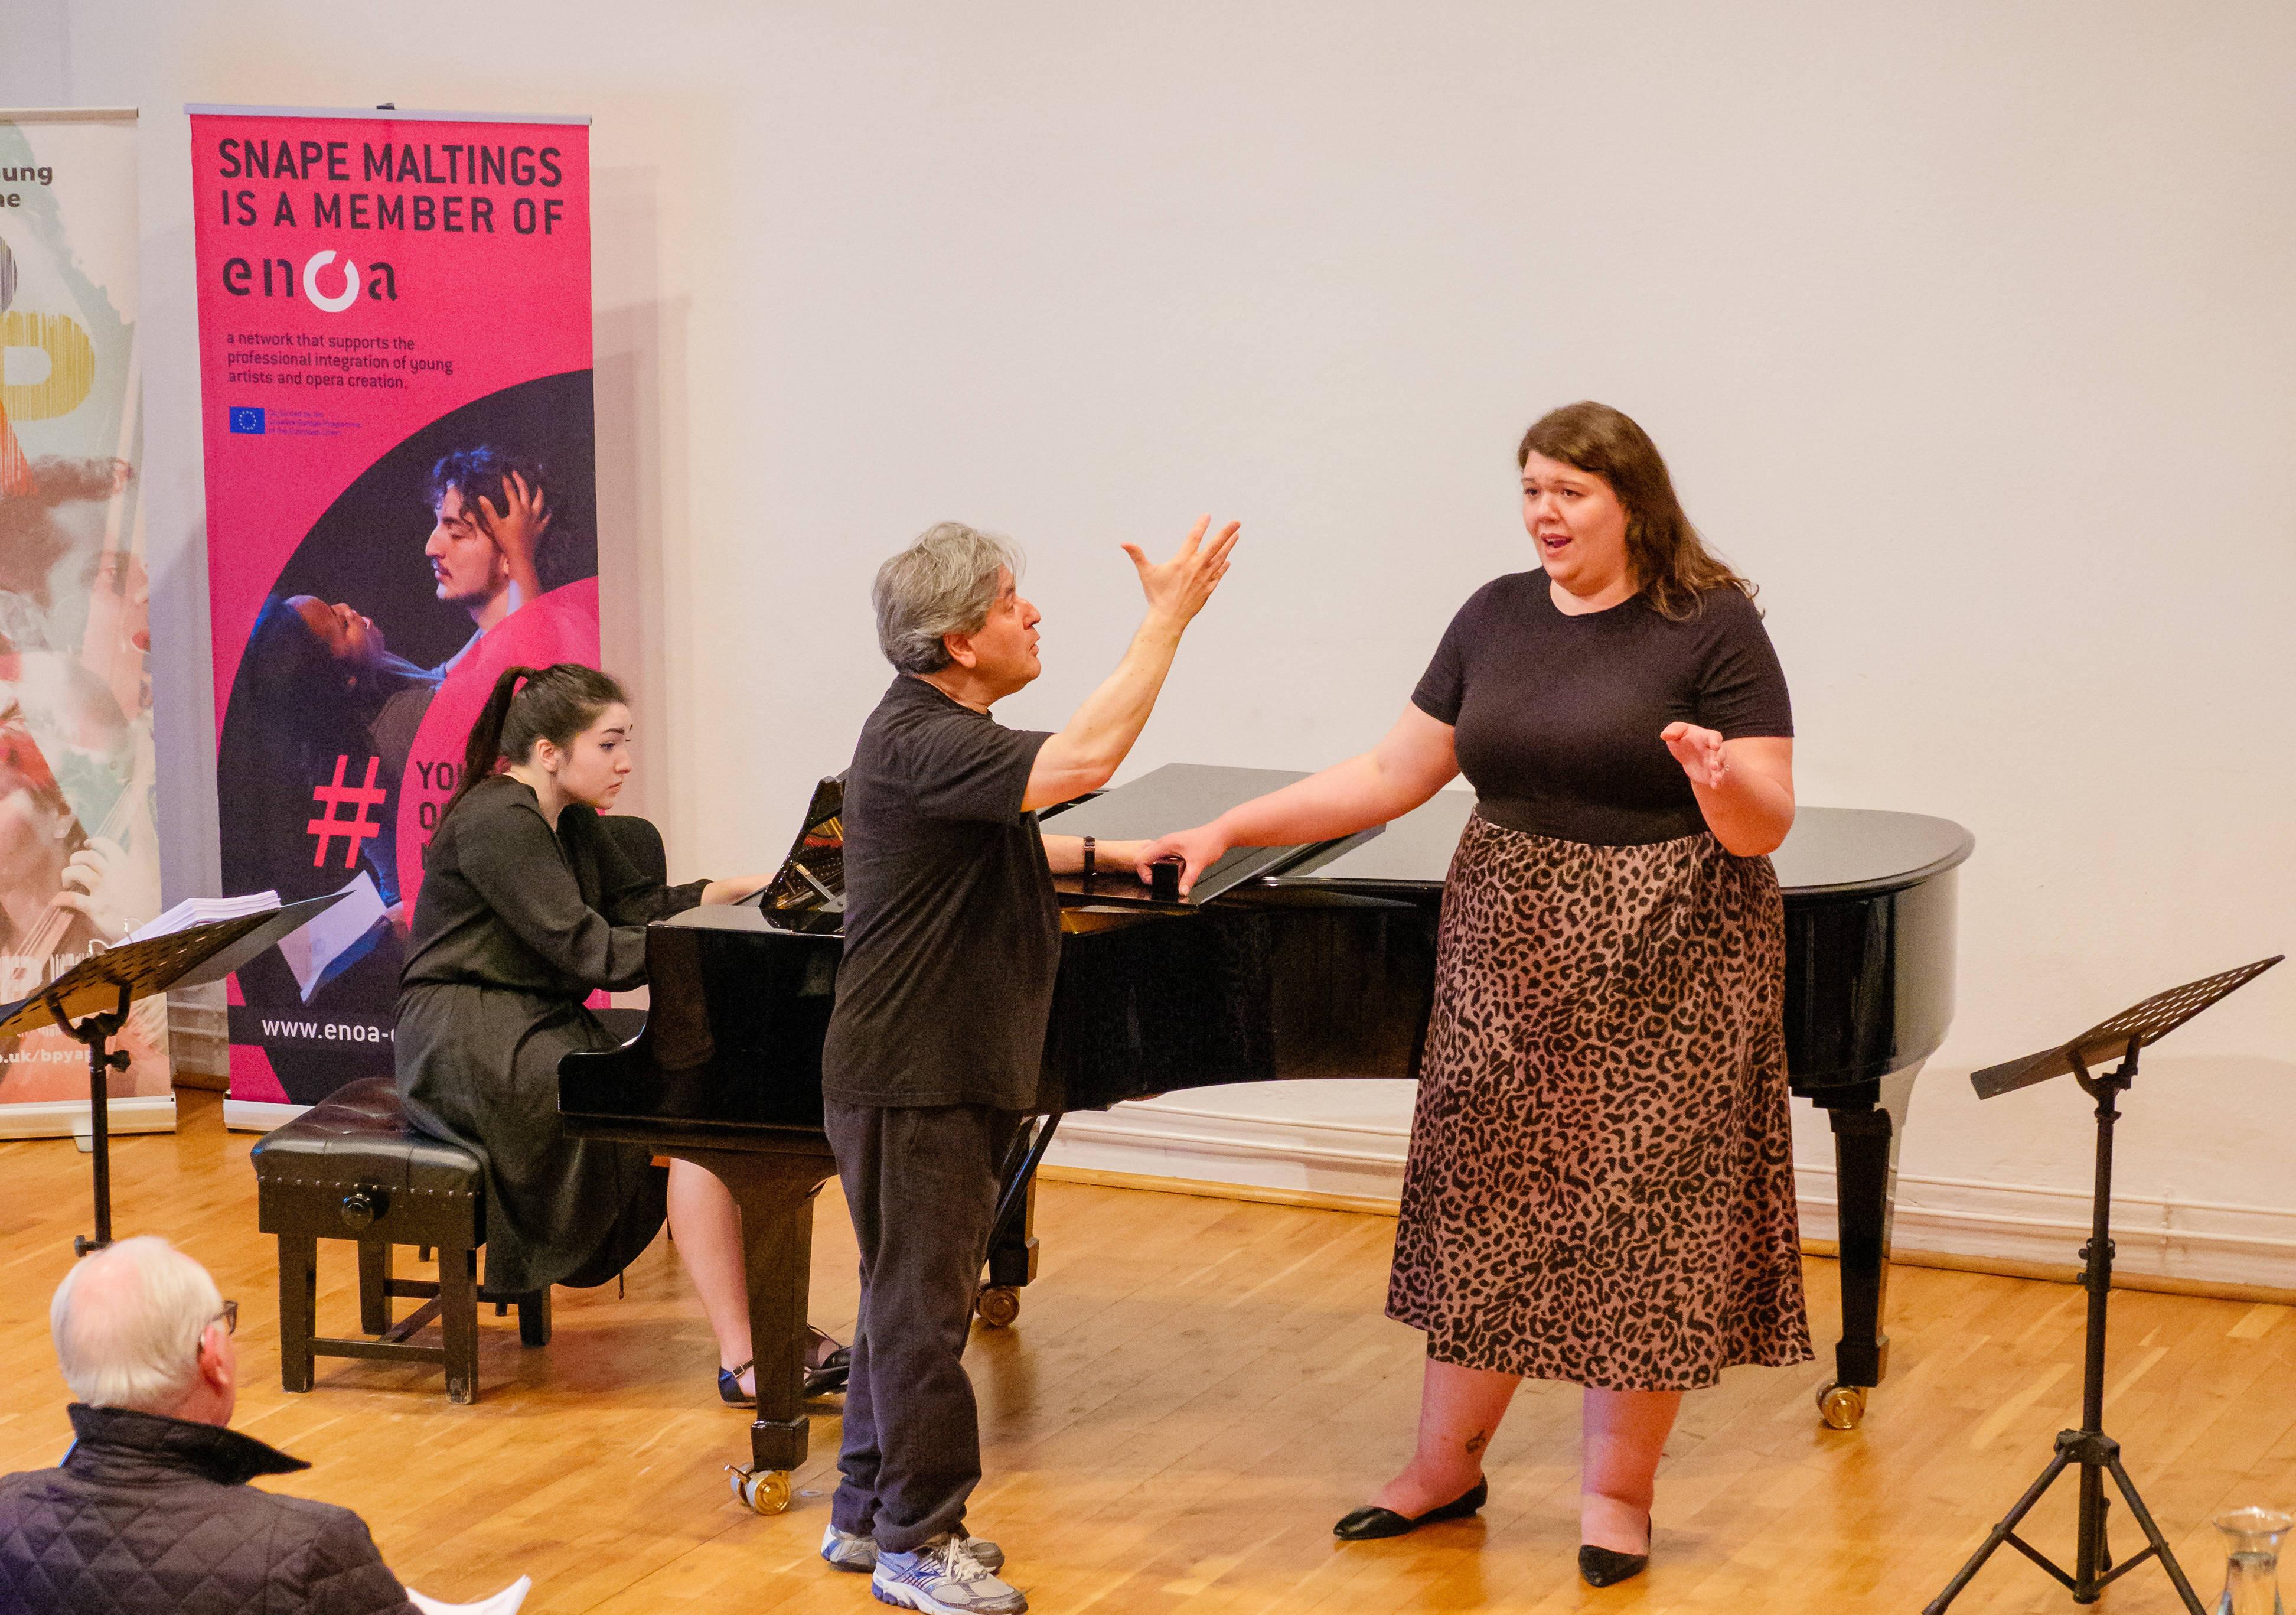 Antonio Pappano teaches contralto Lauren Decker and Katelan Terr